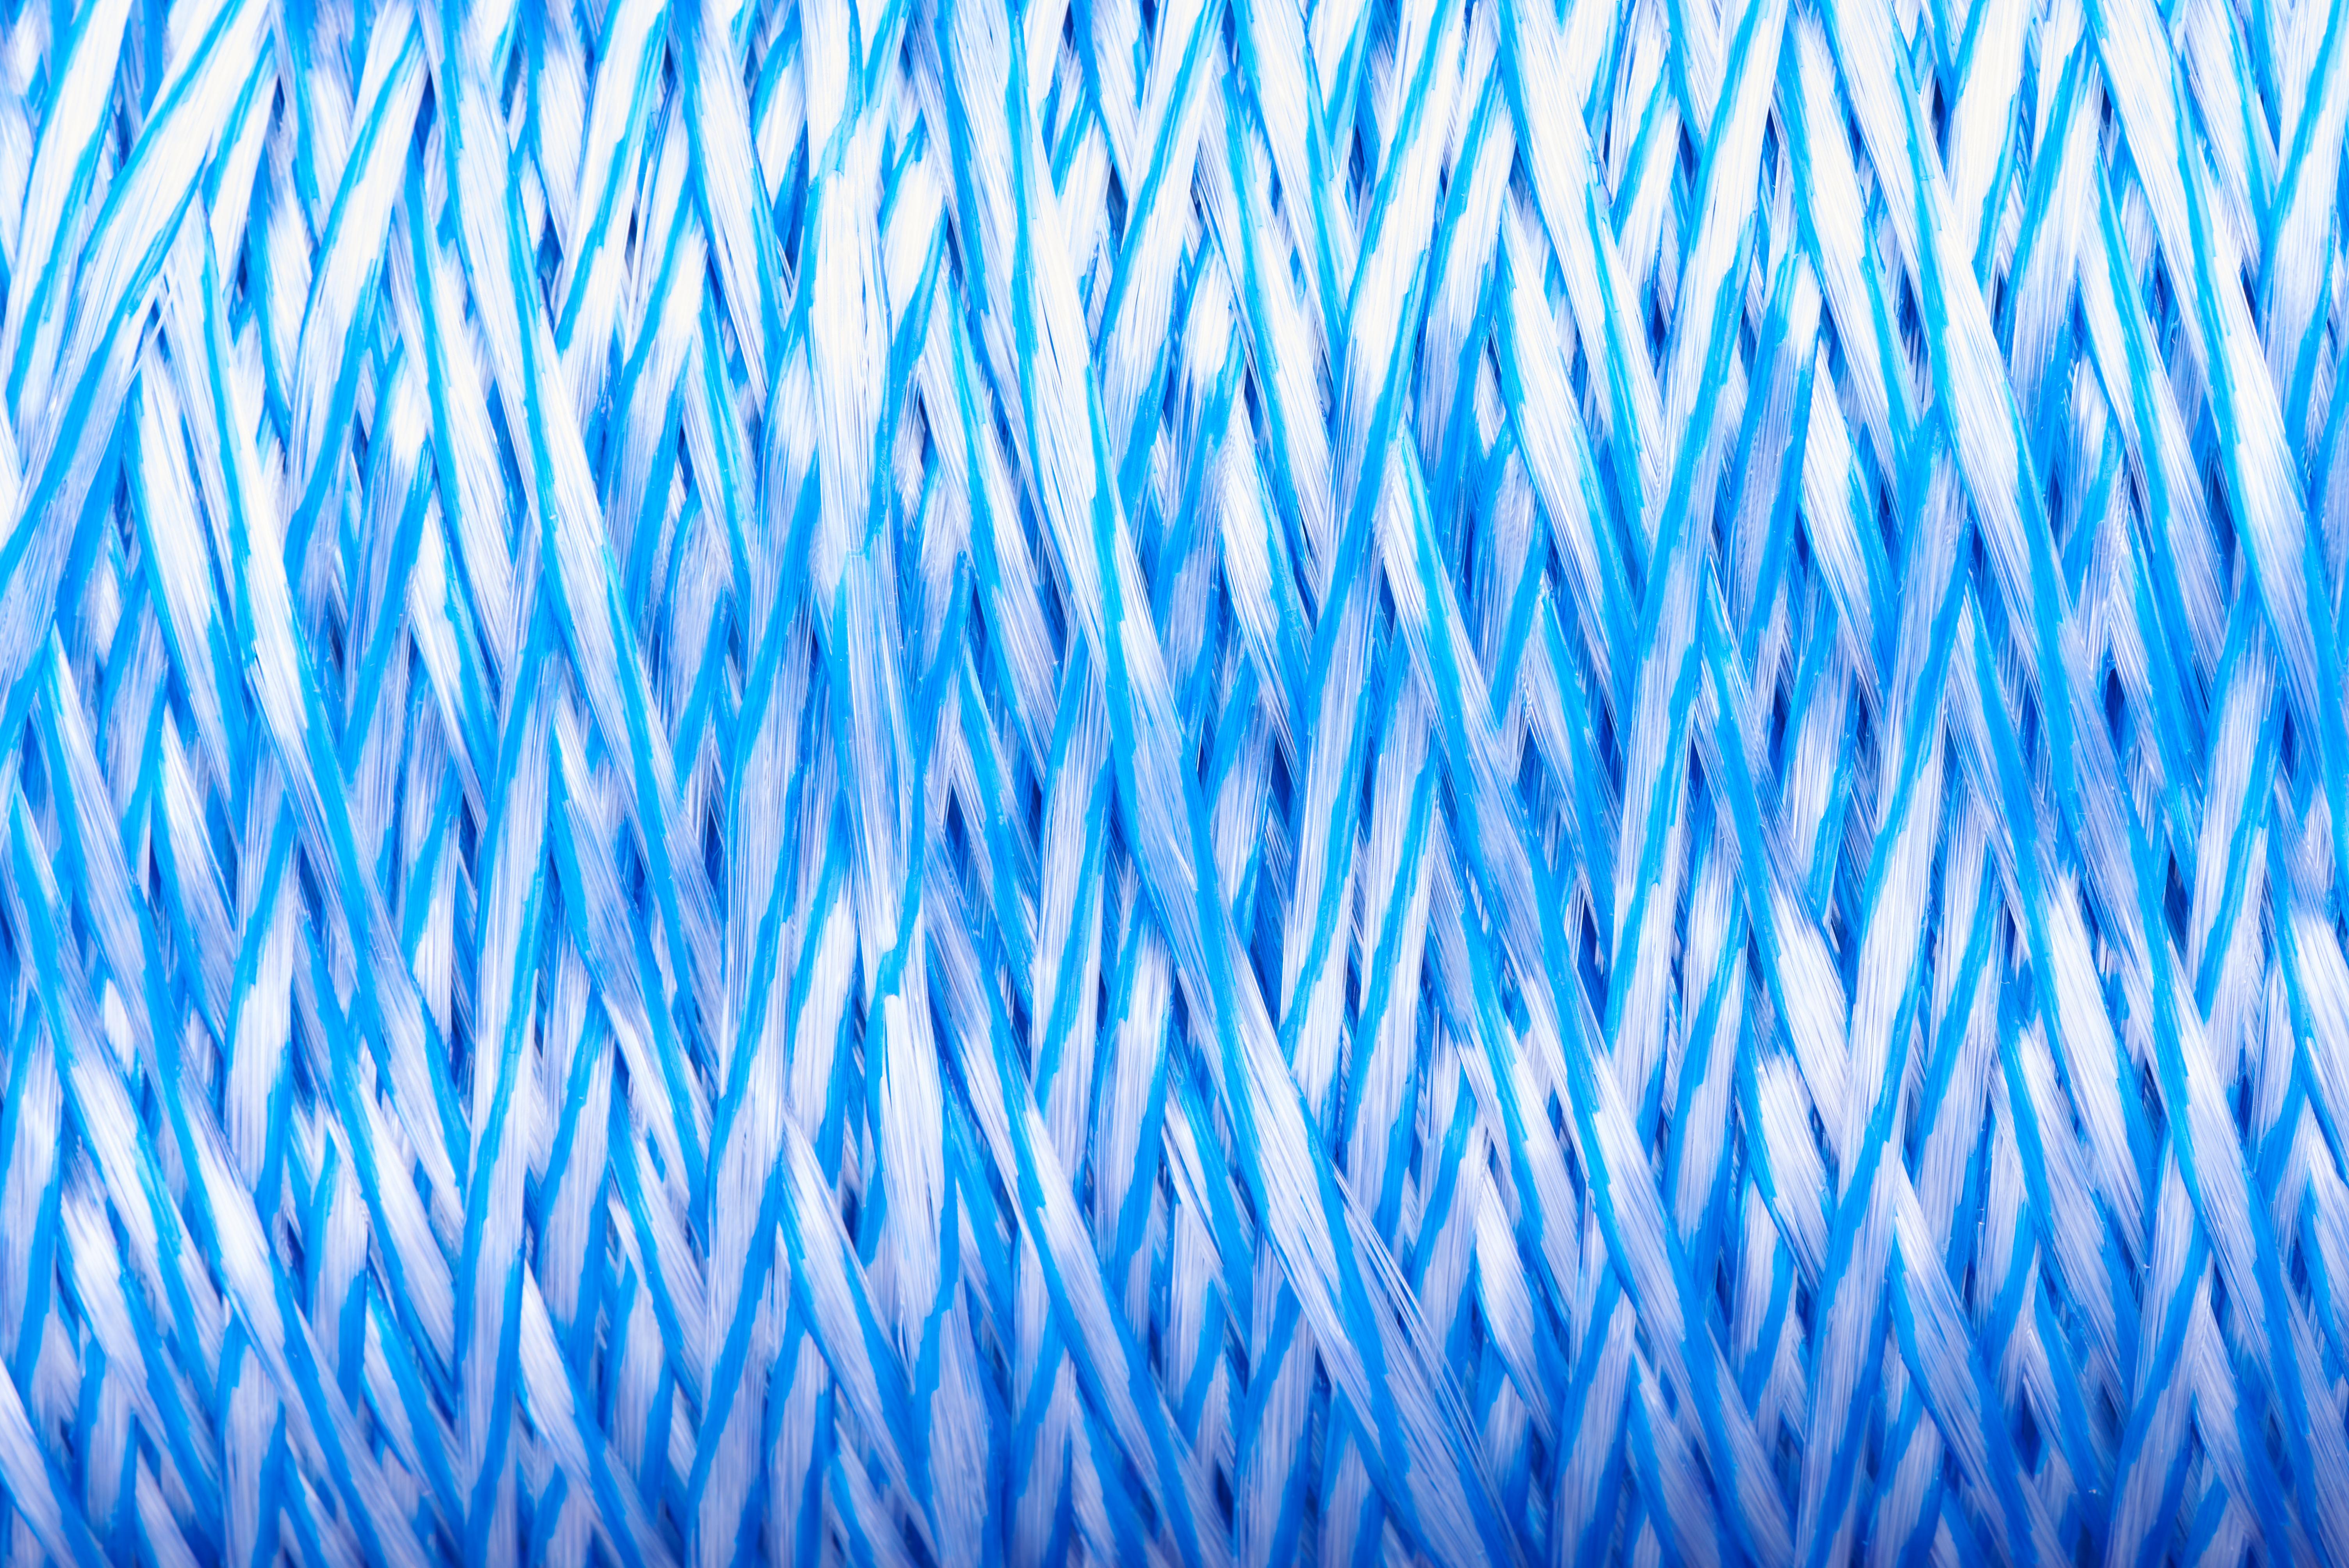 Orion-Cordage-Radiant Film Tying Twine-Blue-Closeup275.jpg